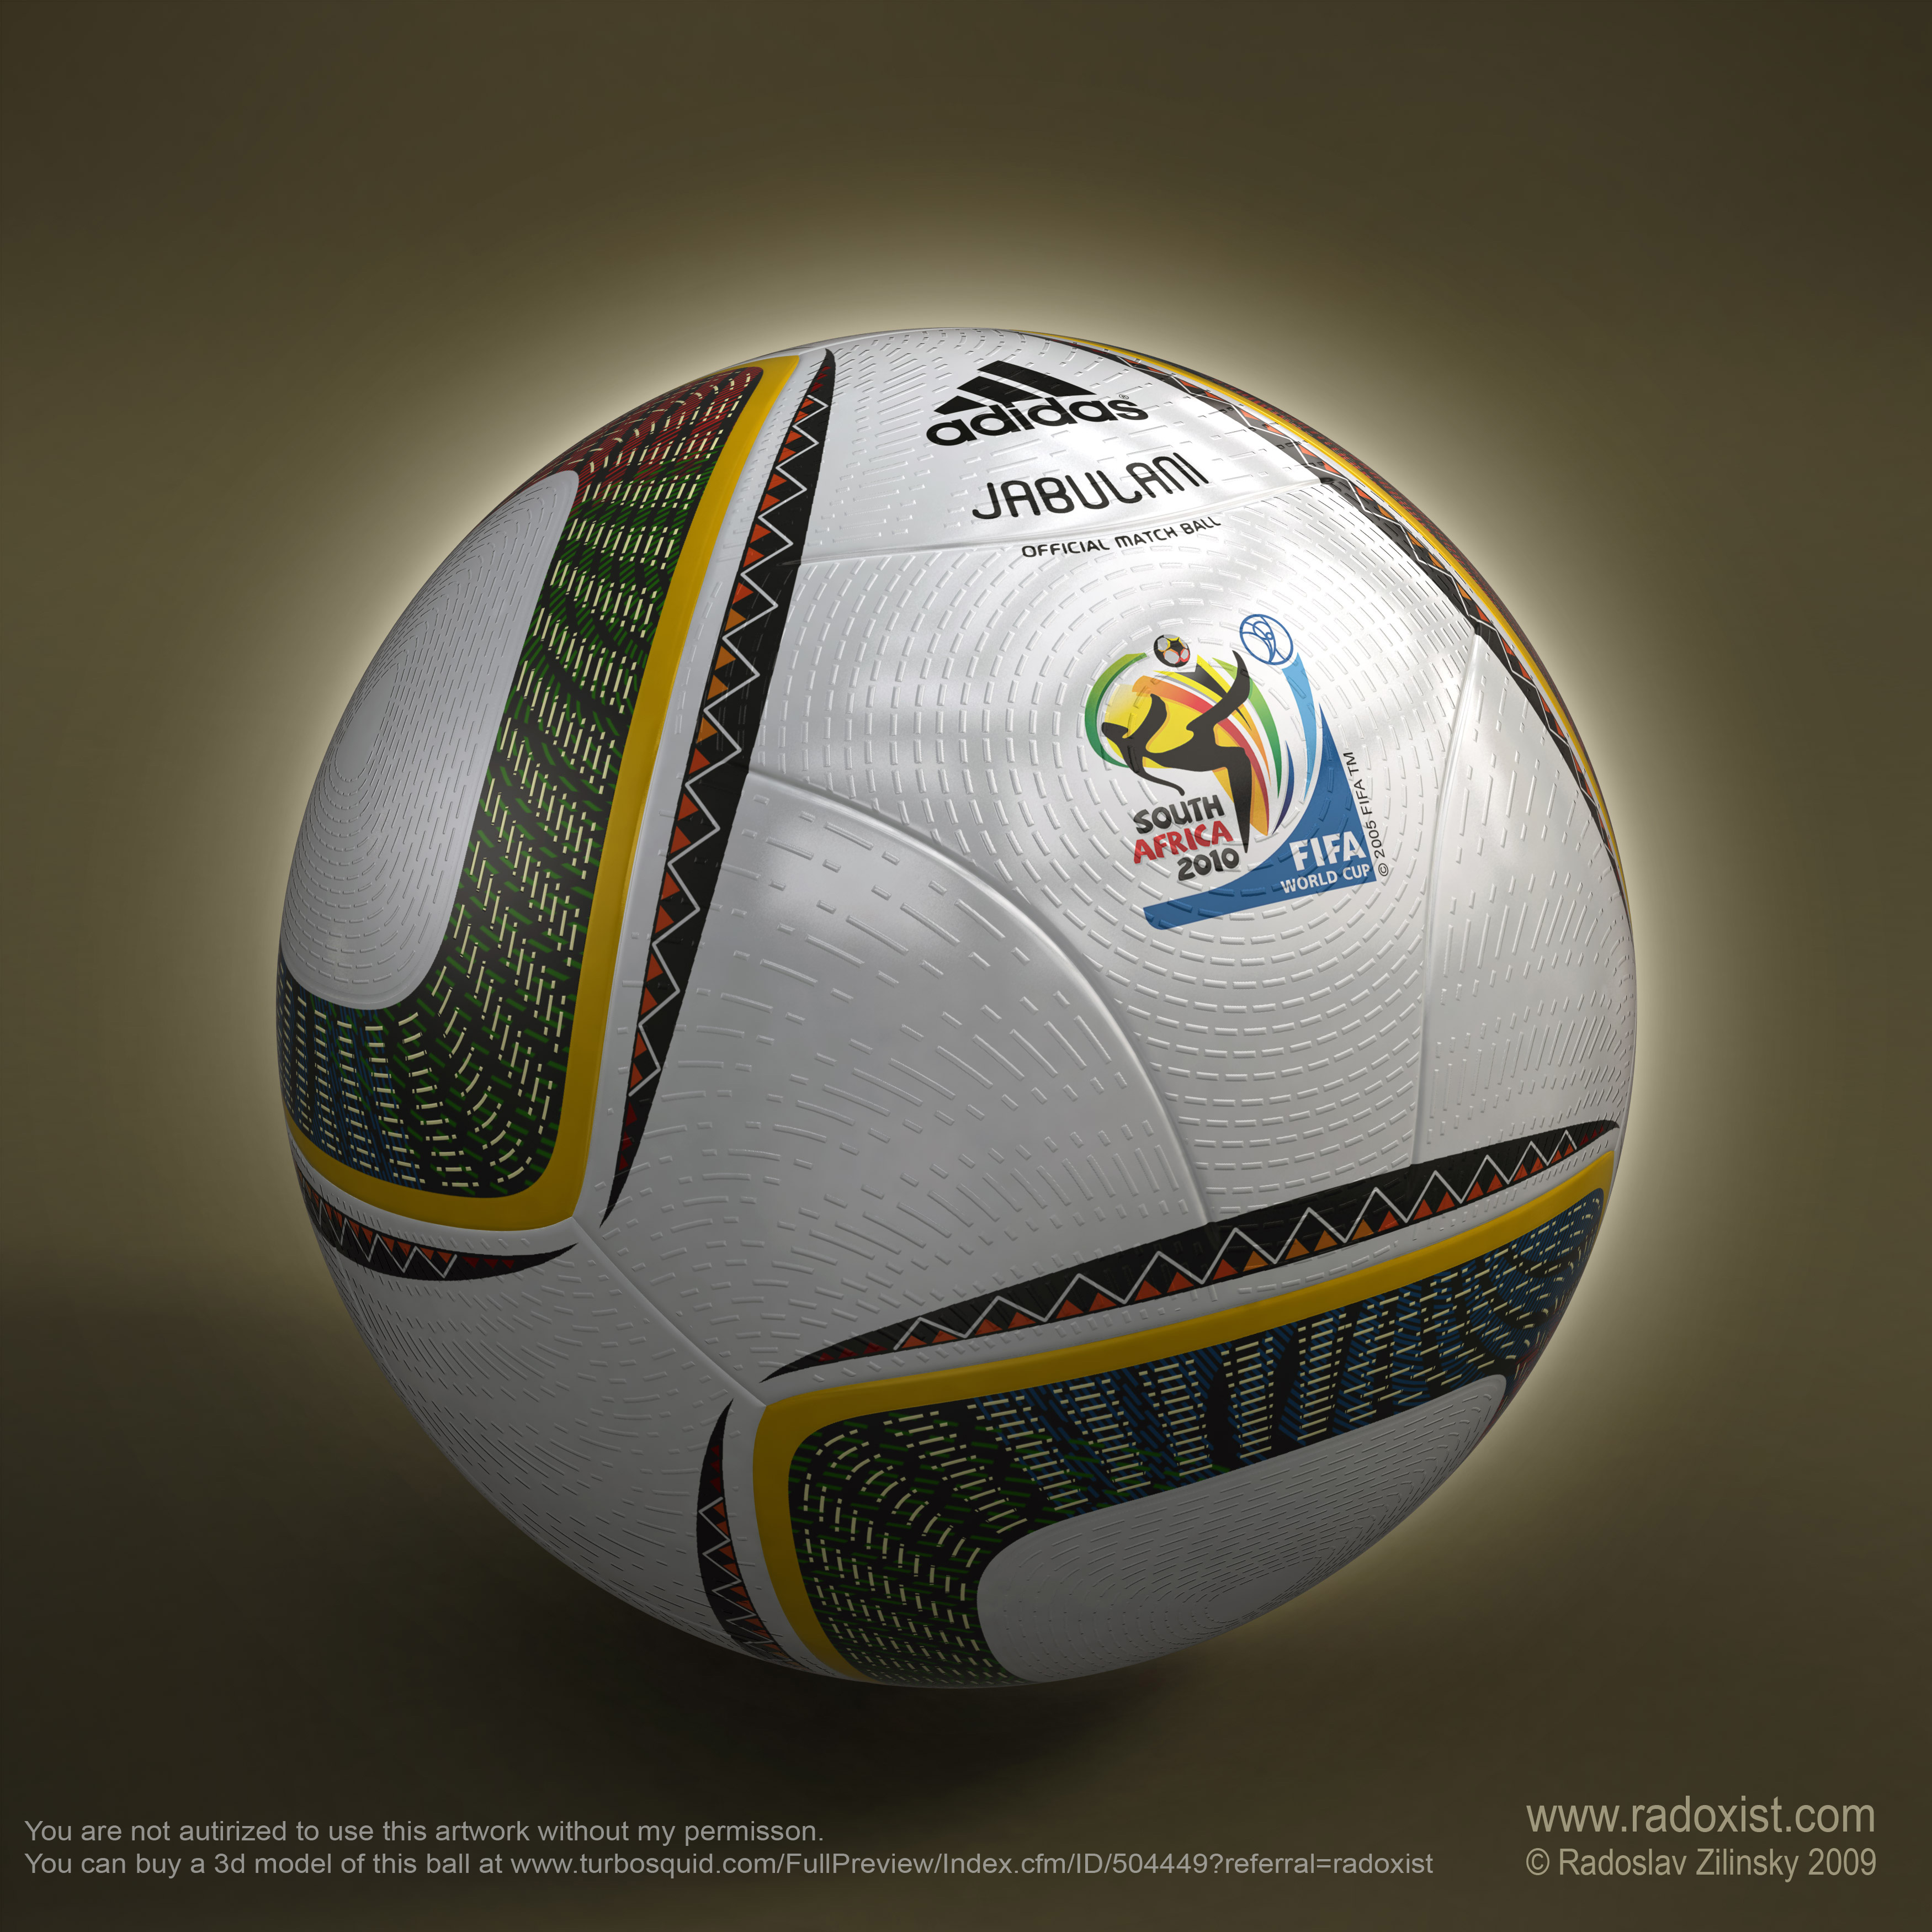 36d92c32f3abe Photo Gallery – Jabulani (Official Match Ball FIFA 2010)